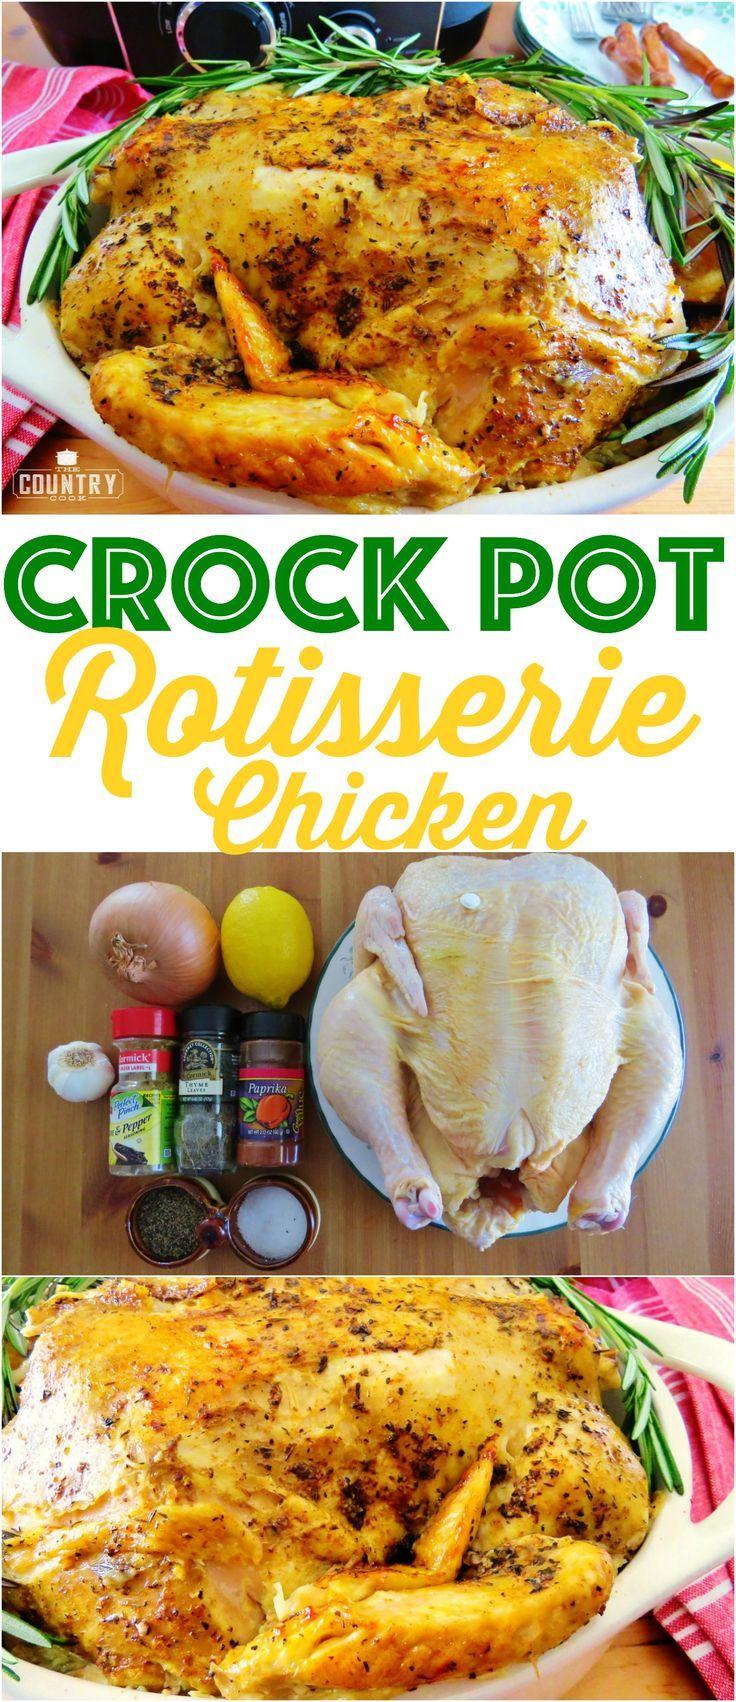 Crock Pot Rotisserie Chicken  Recipe  Back-To-School -6629